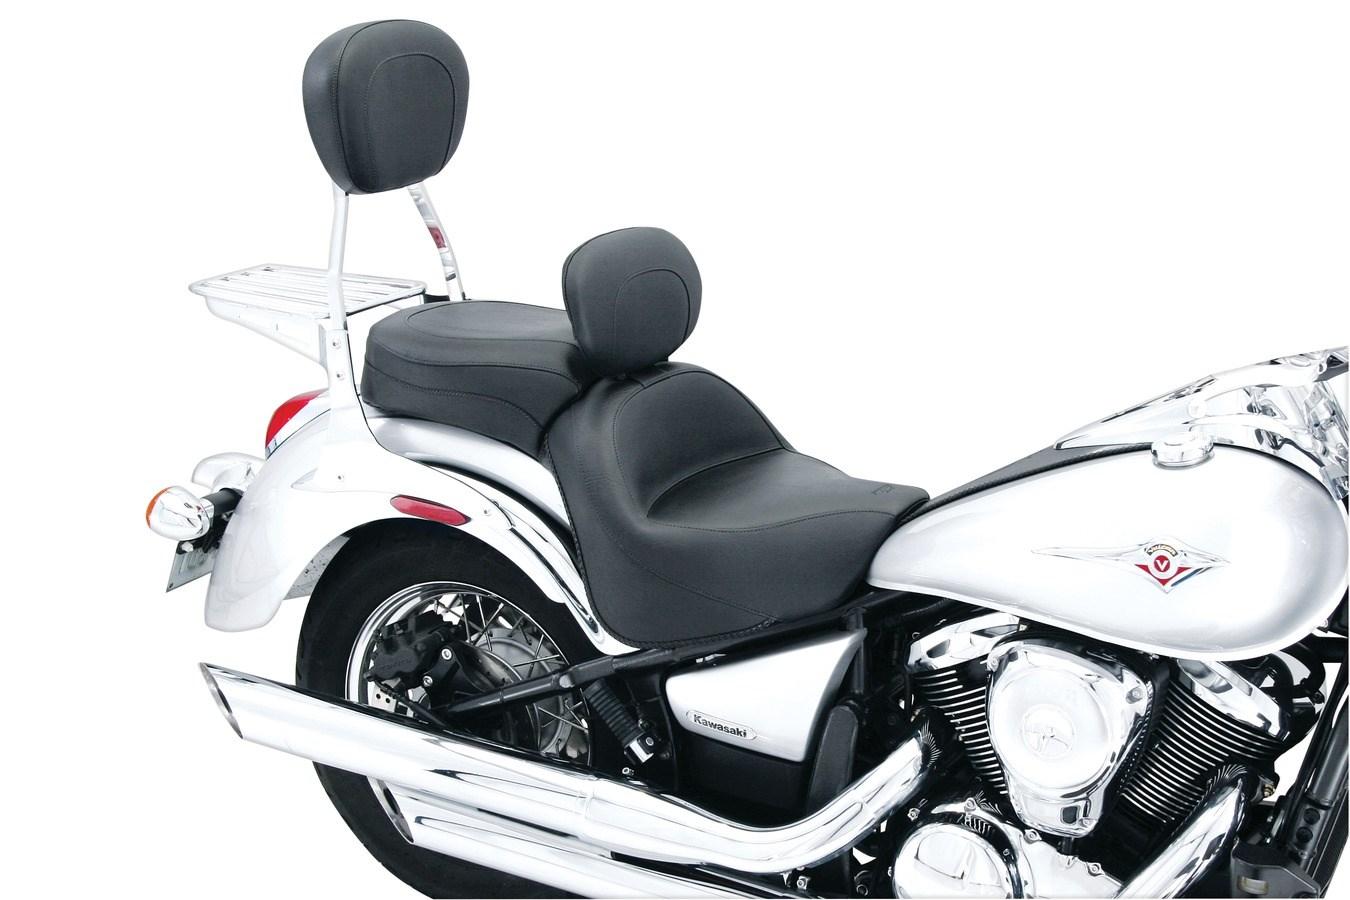 Mustang 76127 Standard Touring One-Piece 2-Up Motorcycle Seat for Kawasaki Vulcan 900 2006-18 Black